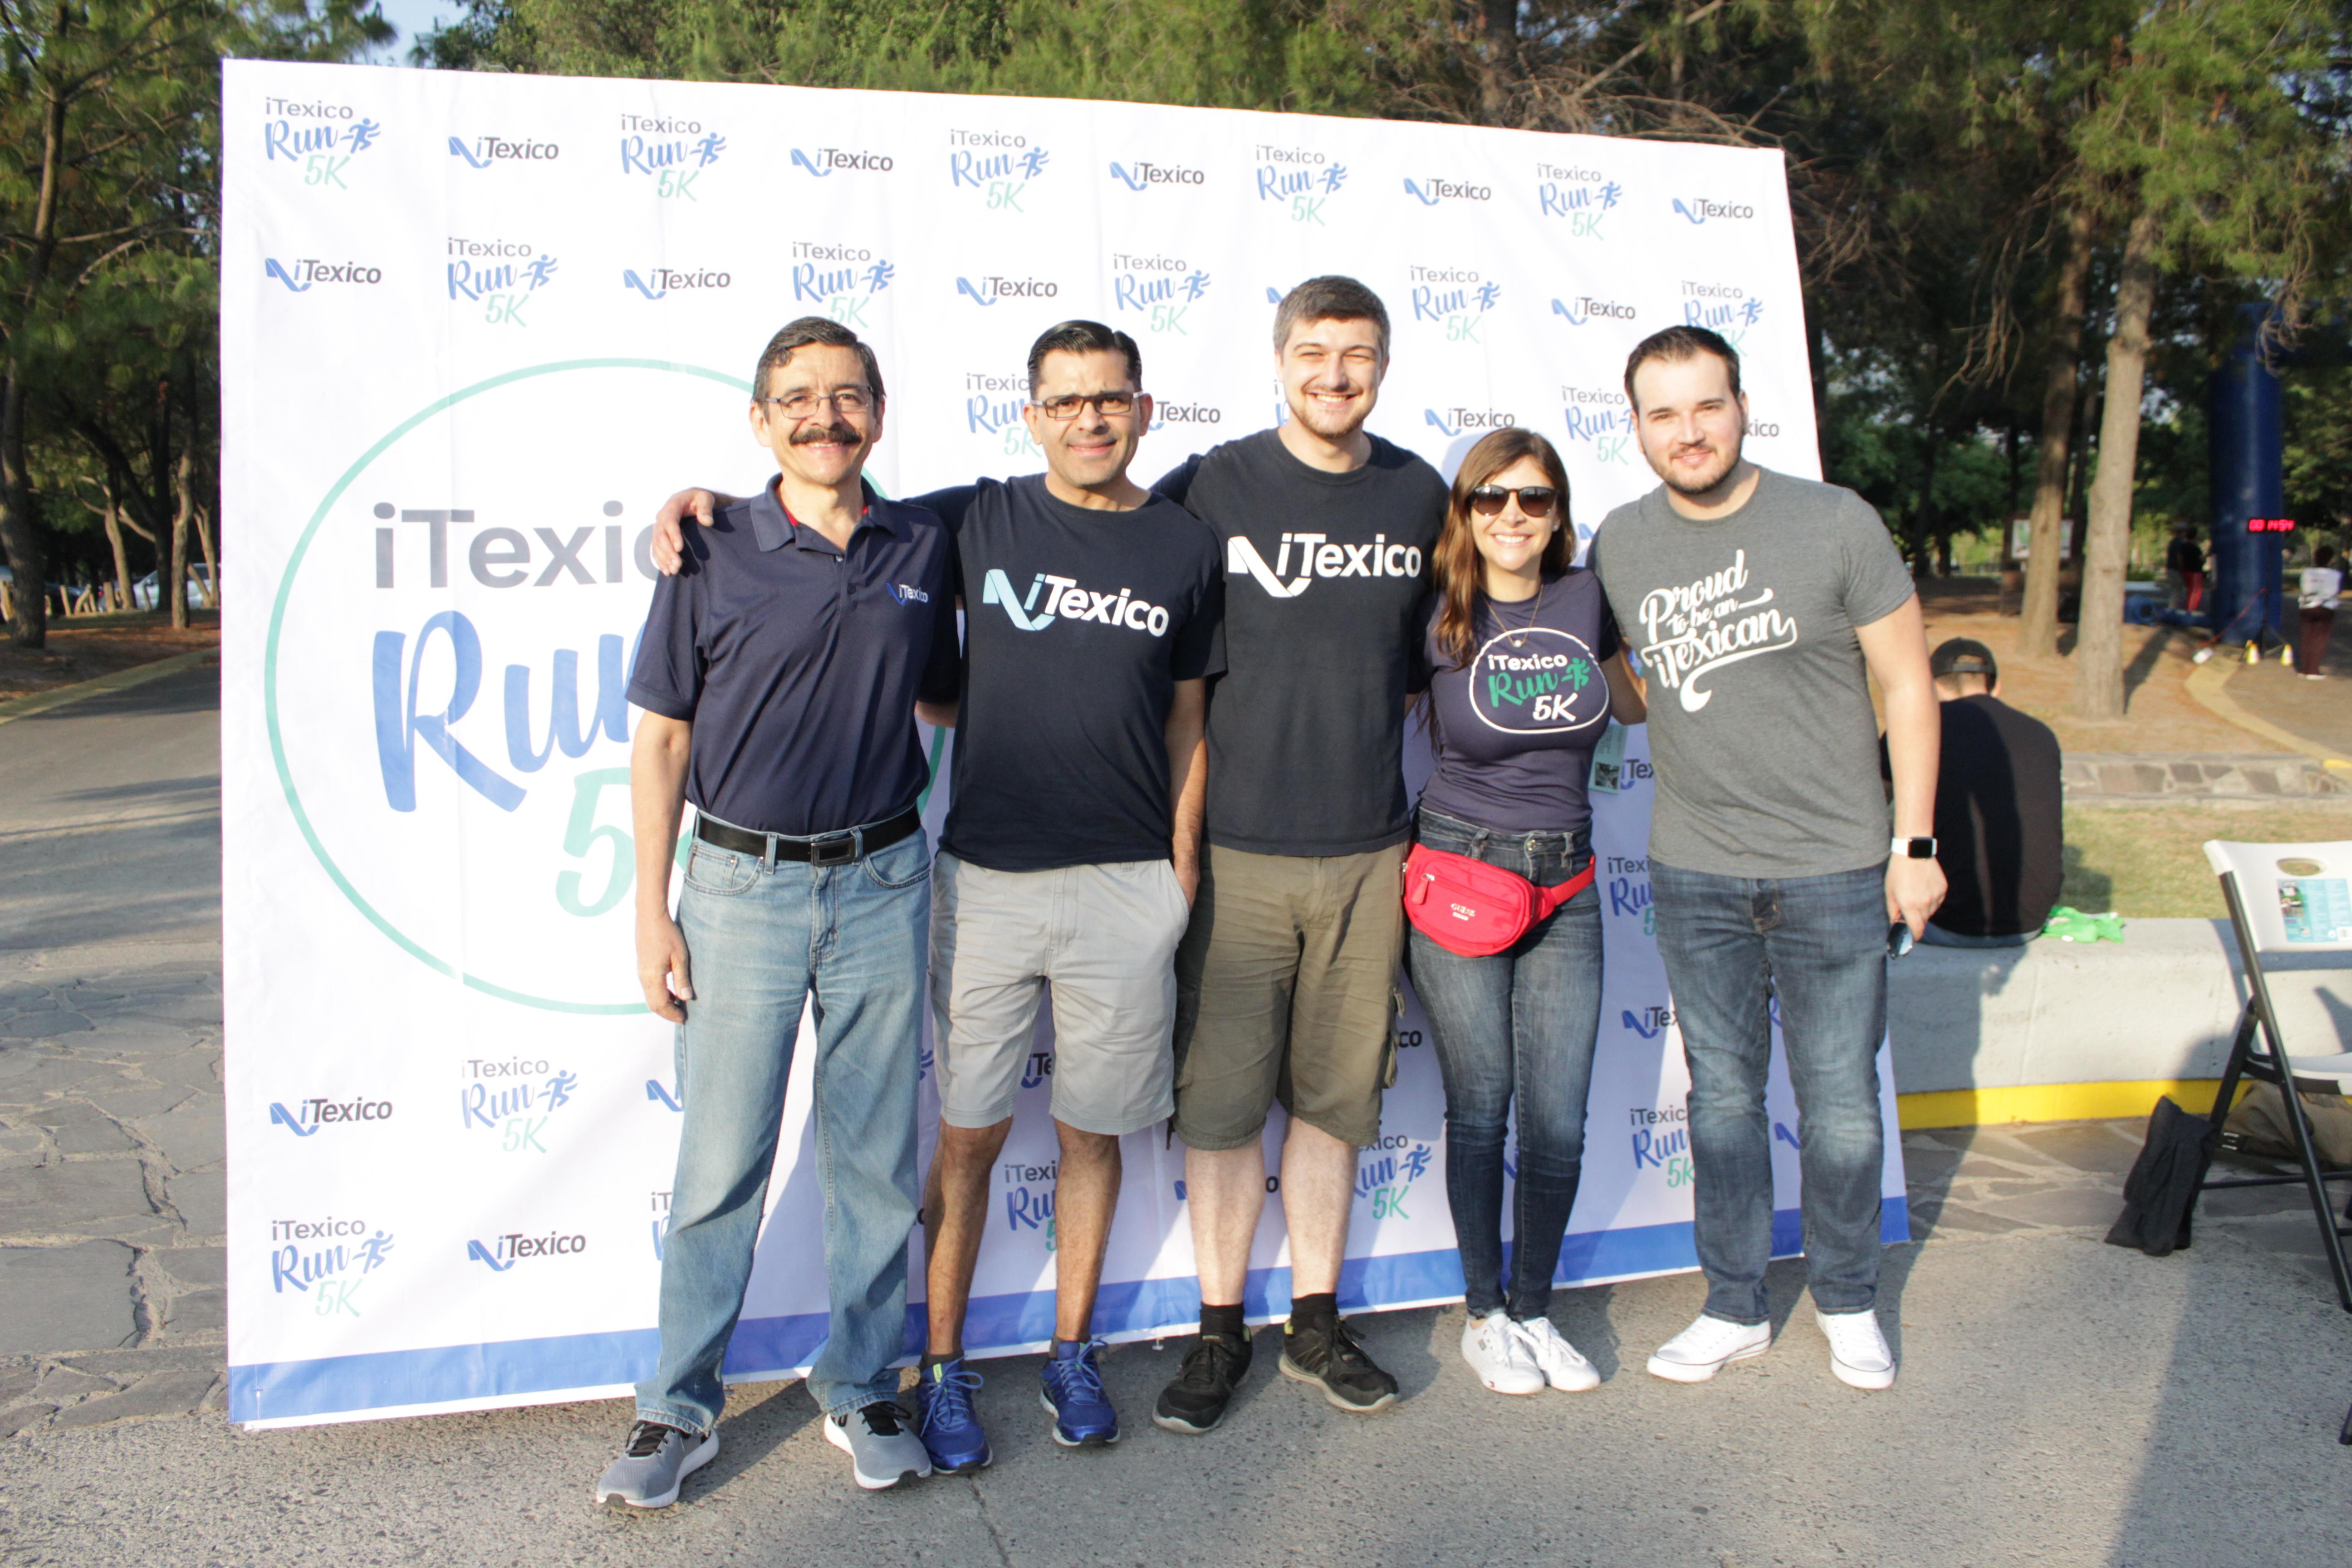 iTexico-Run0517